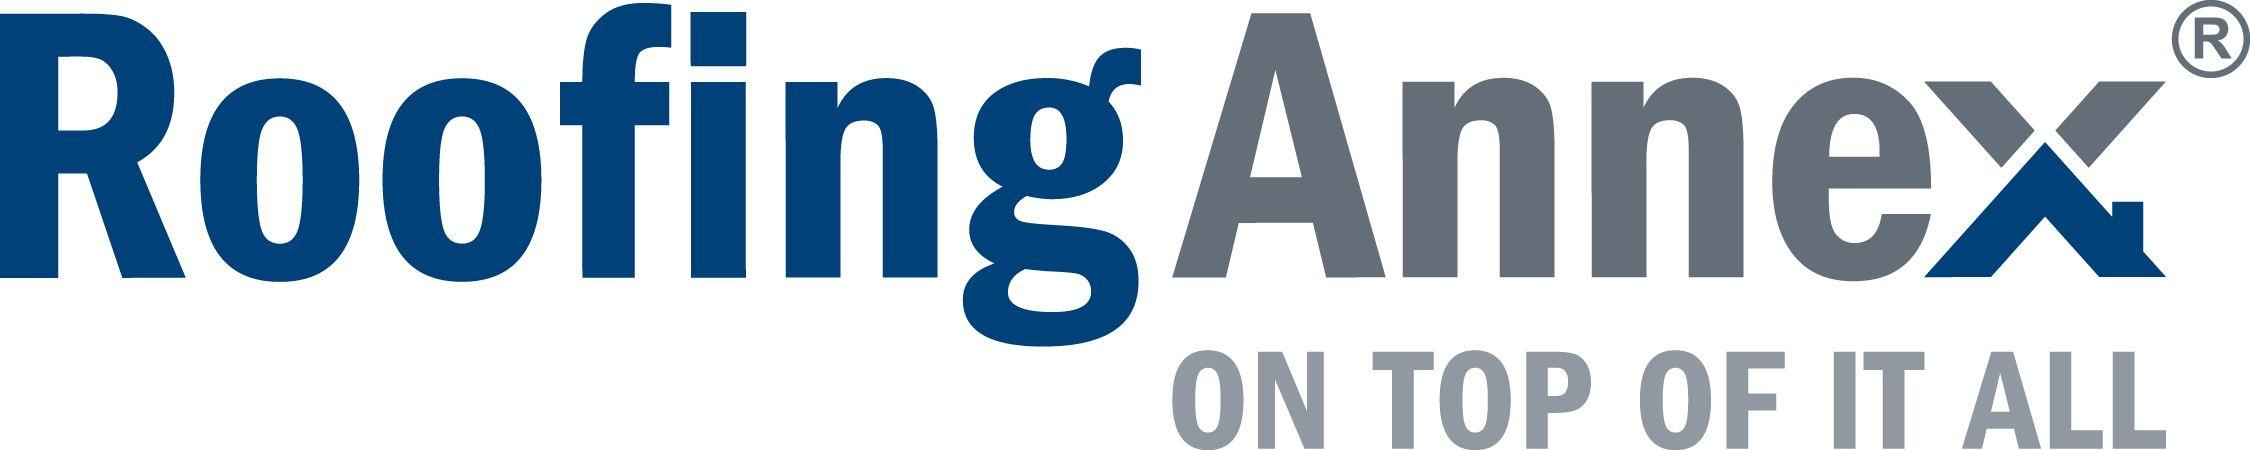 roofingannex Logo